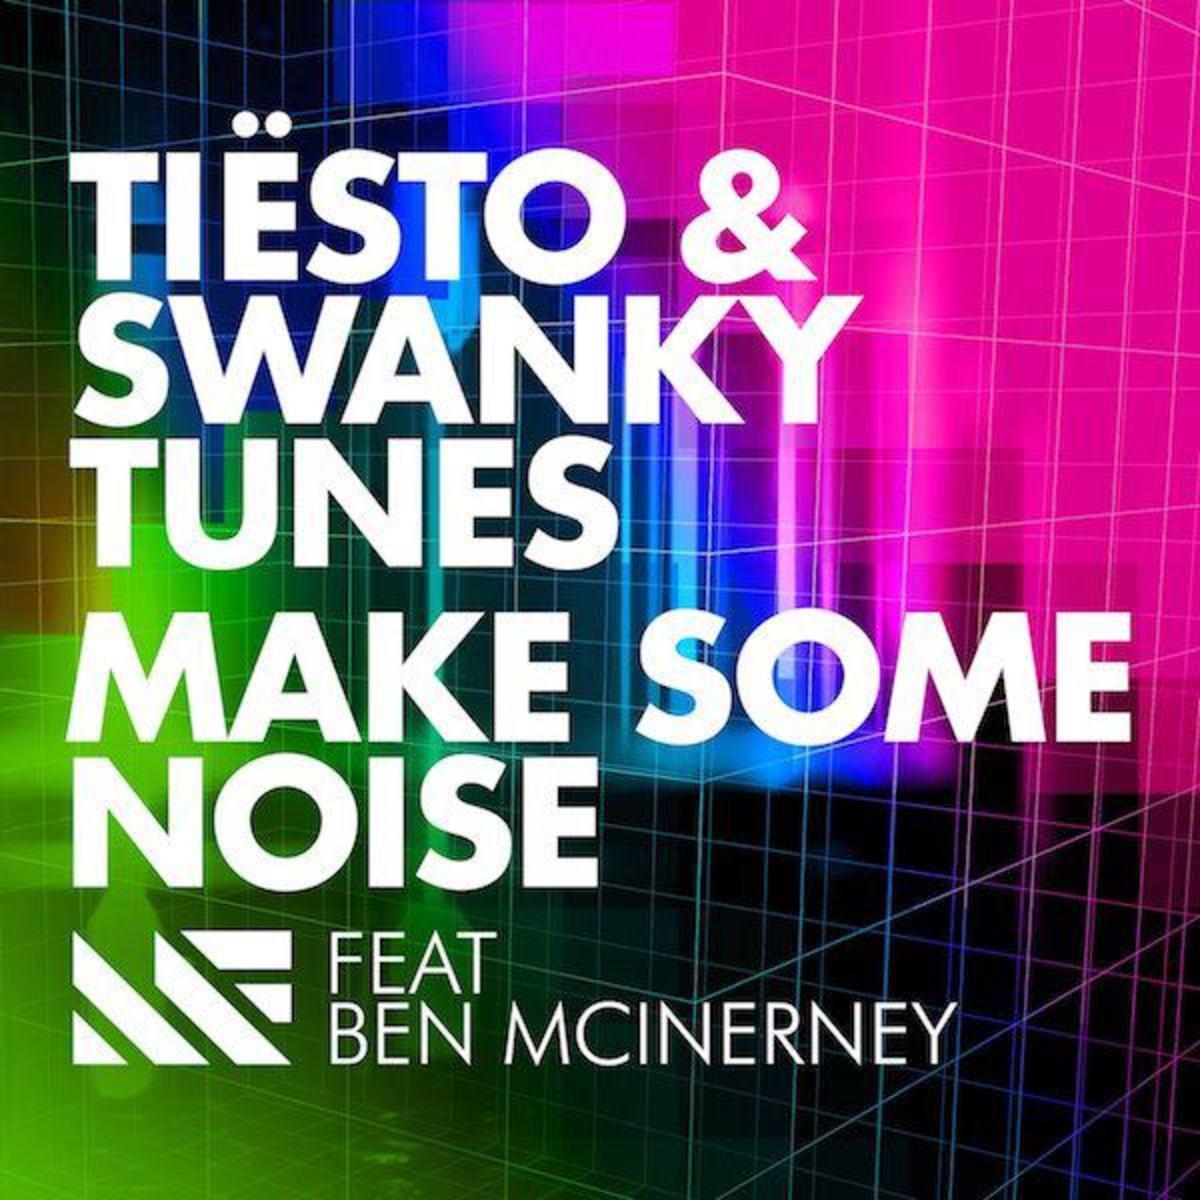 Tiesto-Swanky-Tunes-Make-Some-Noise-2012